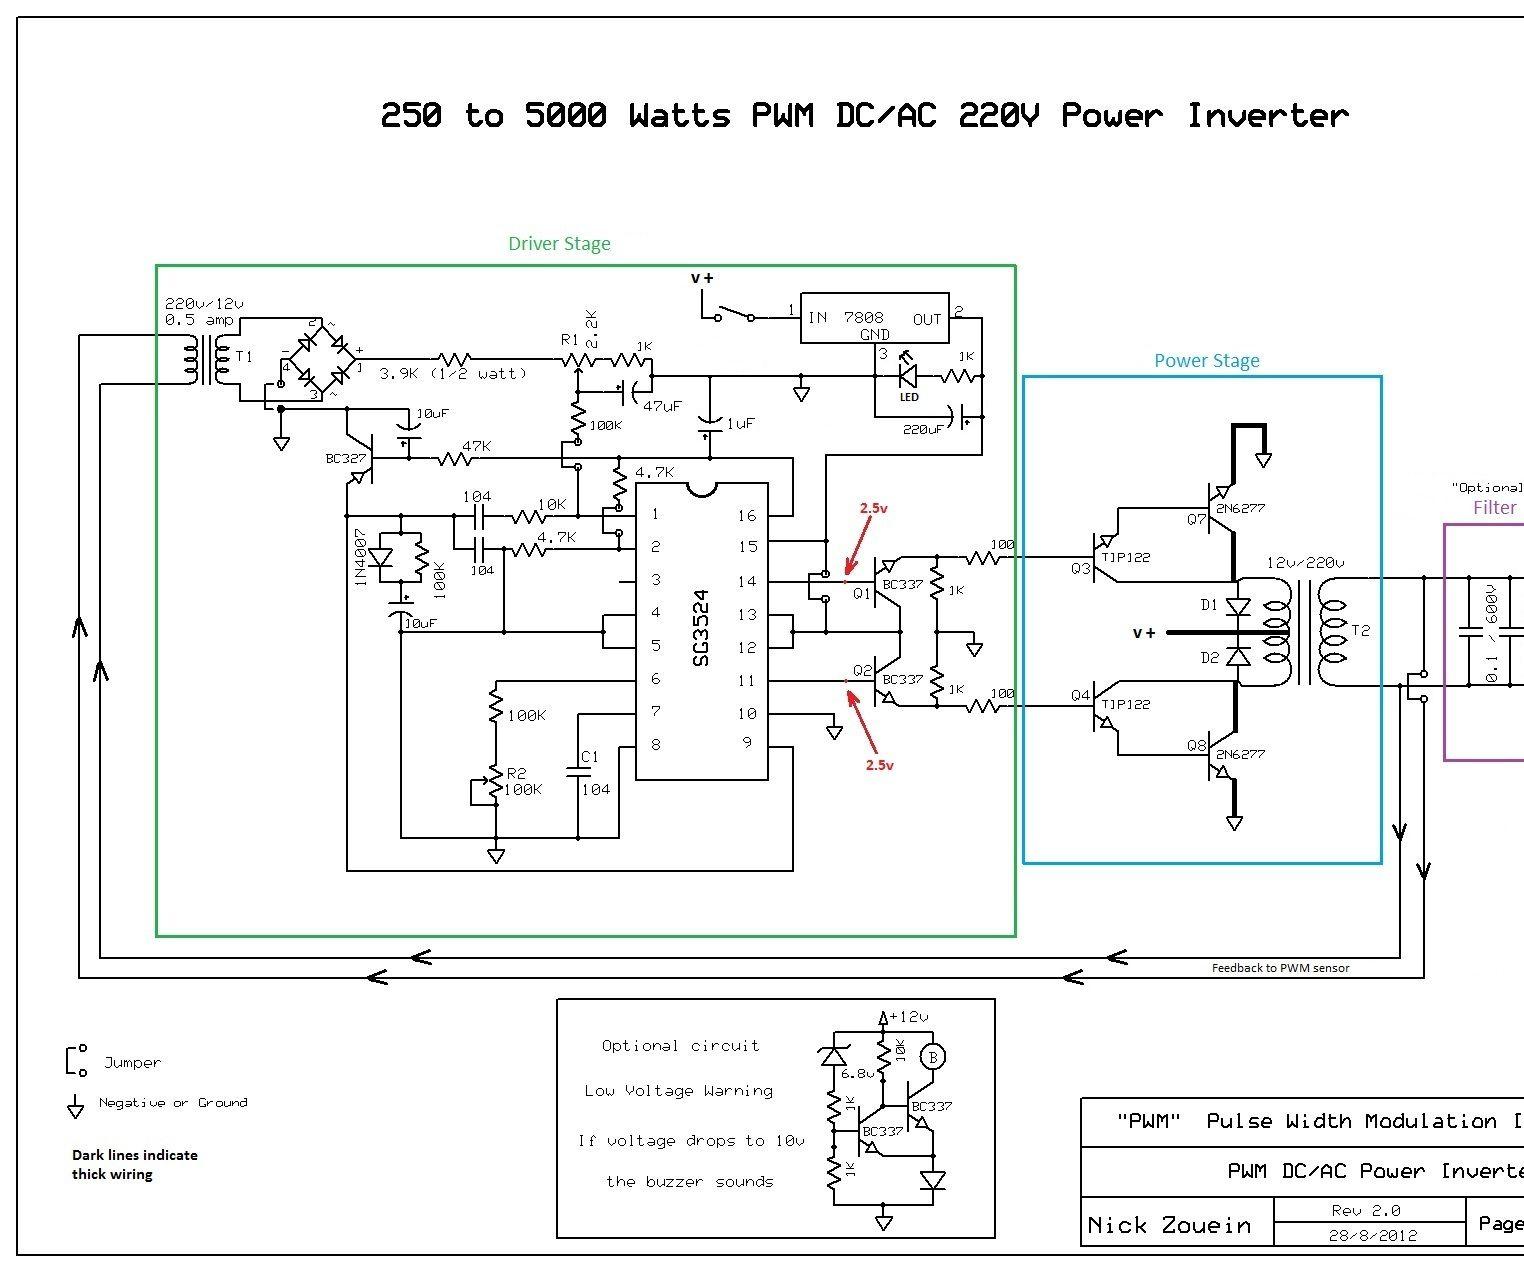 medium resolution of 120v schematic wiring wiring diagrams konsult12v to 120v transformer wiring diagram free picture wiring diagram 120v